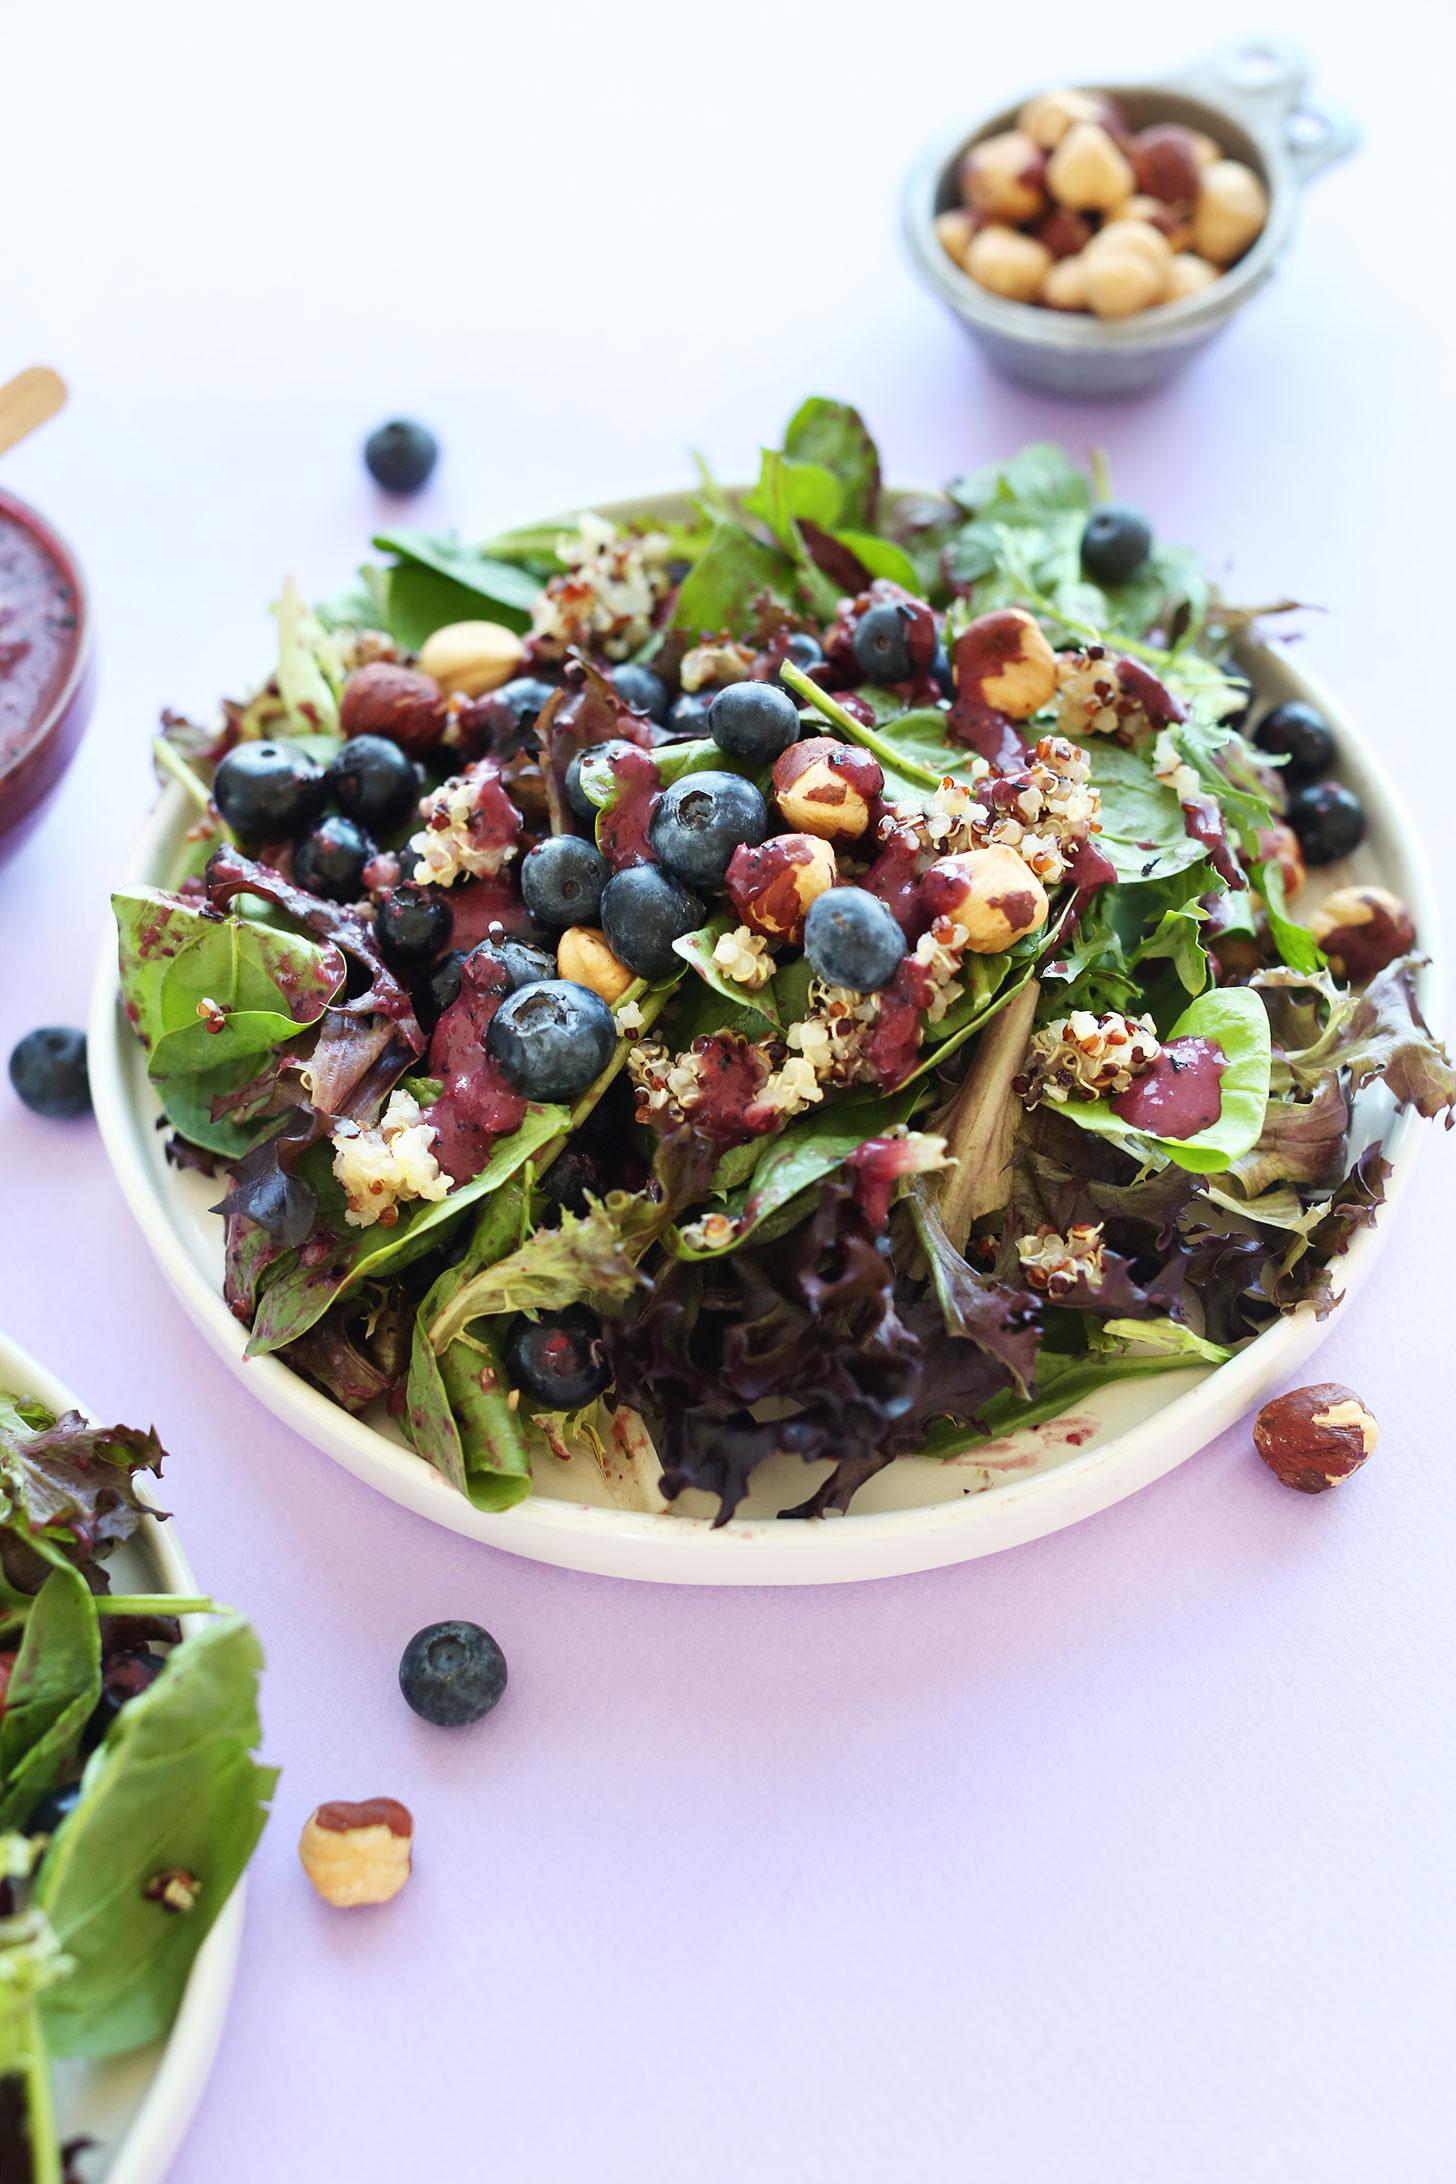 HEALTHY-Blueberry-Quinoa-Hazelnut-Salad-with-a-Blueberry-Balsamic-Vinaigrette-vegan-recipe-healthy-dinner-salad-blueberry-glutenfree.jpg.jpg